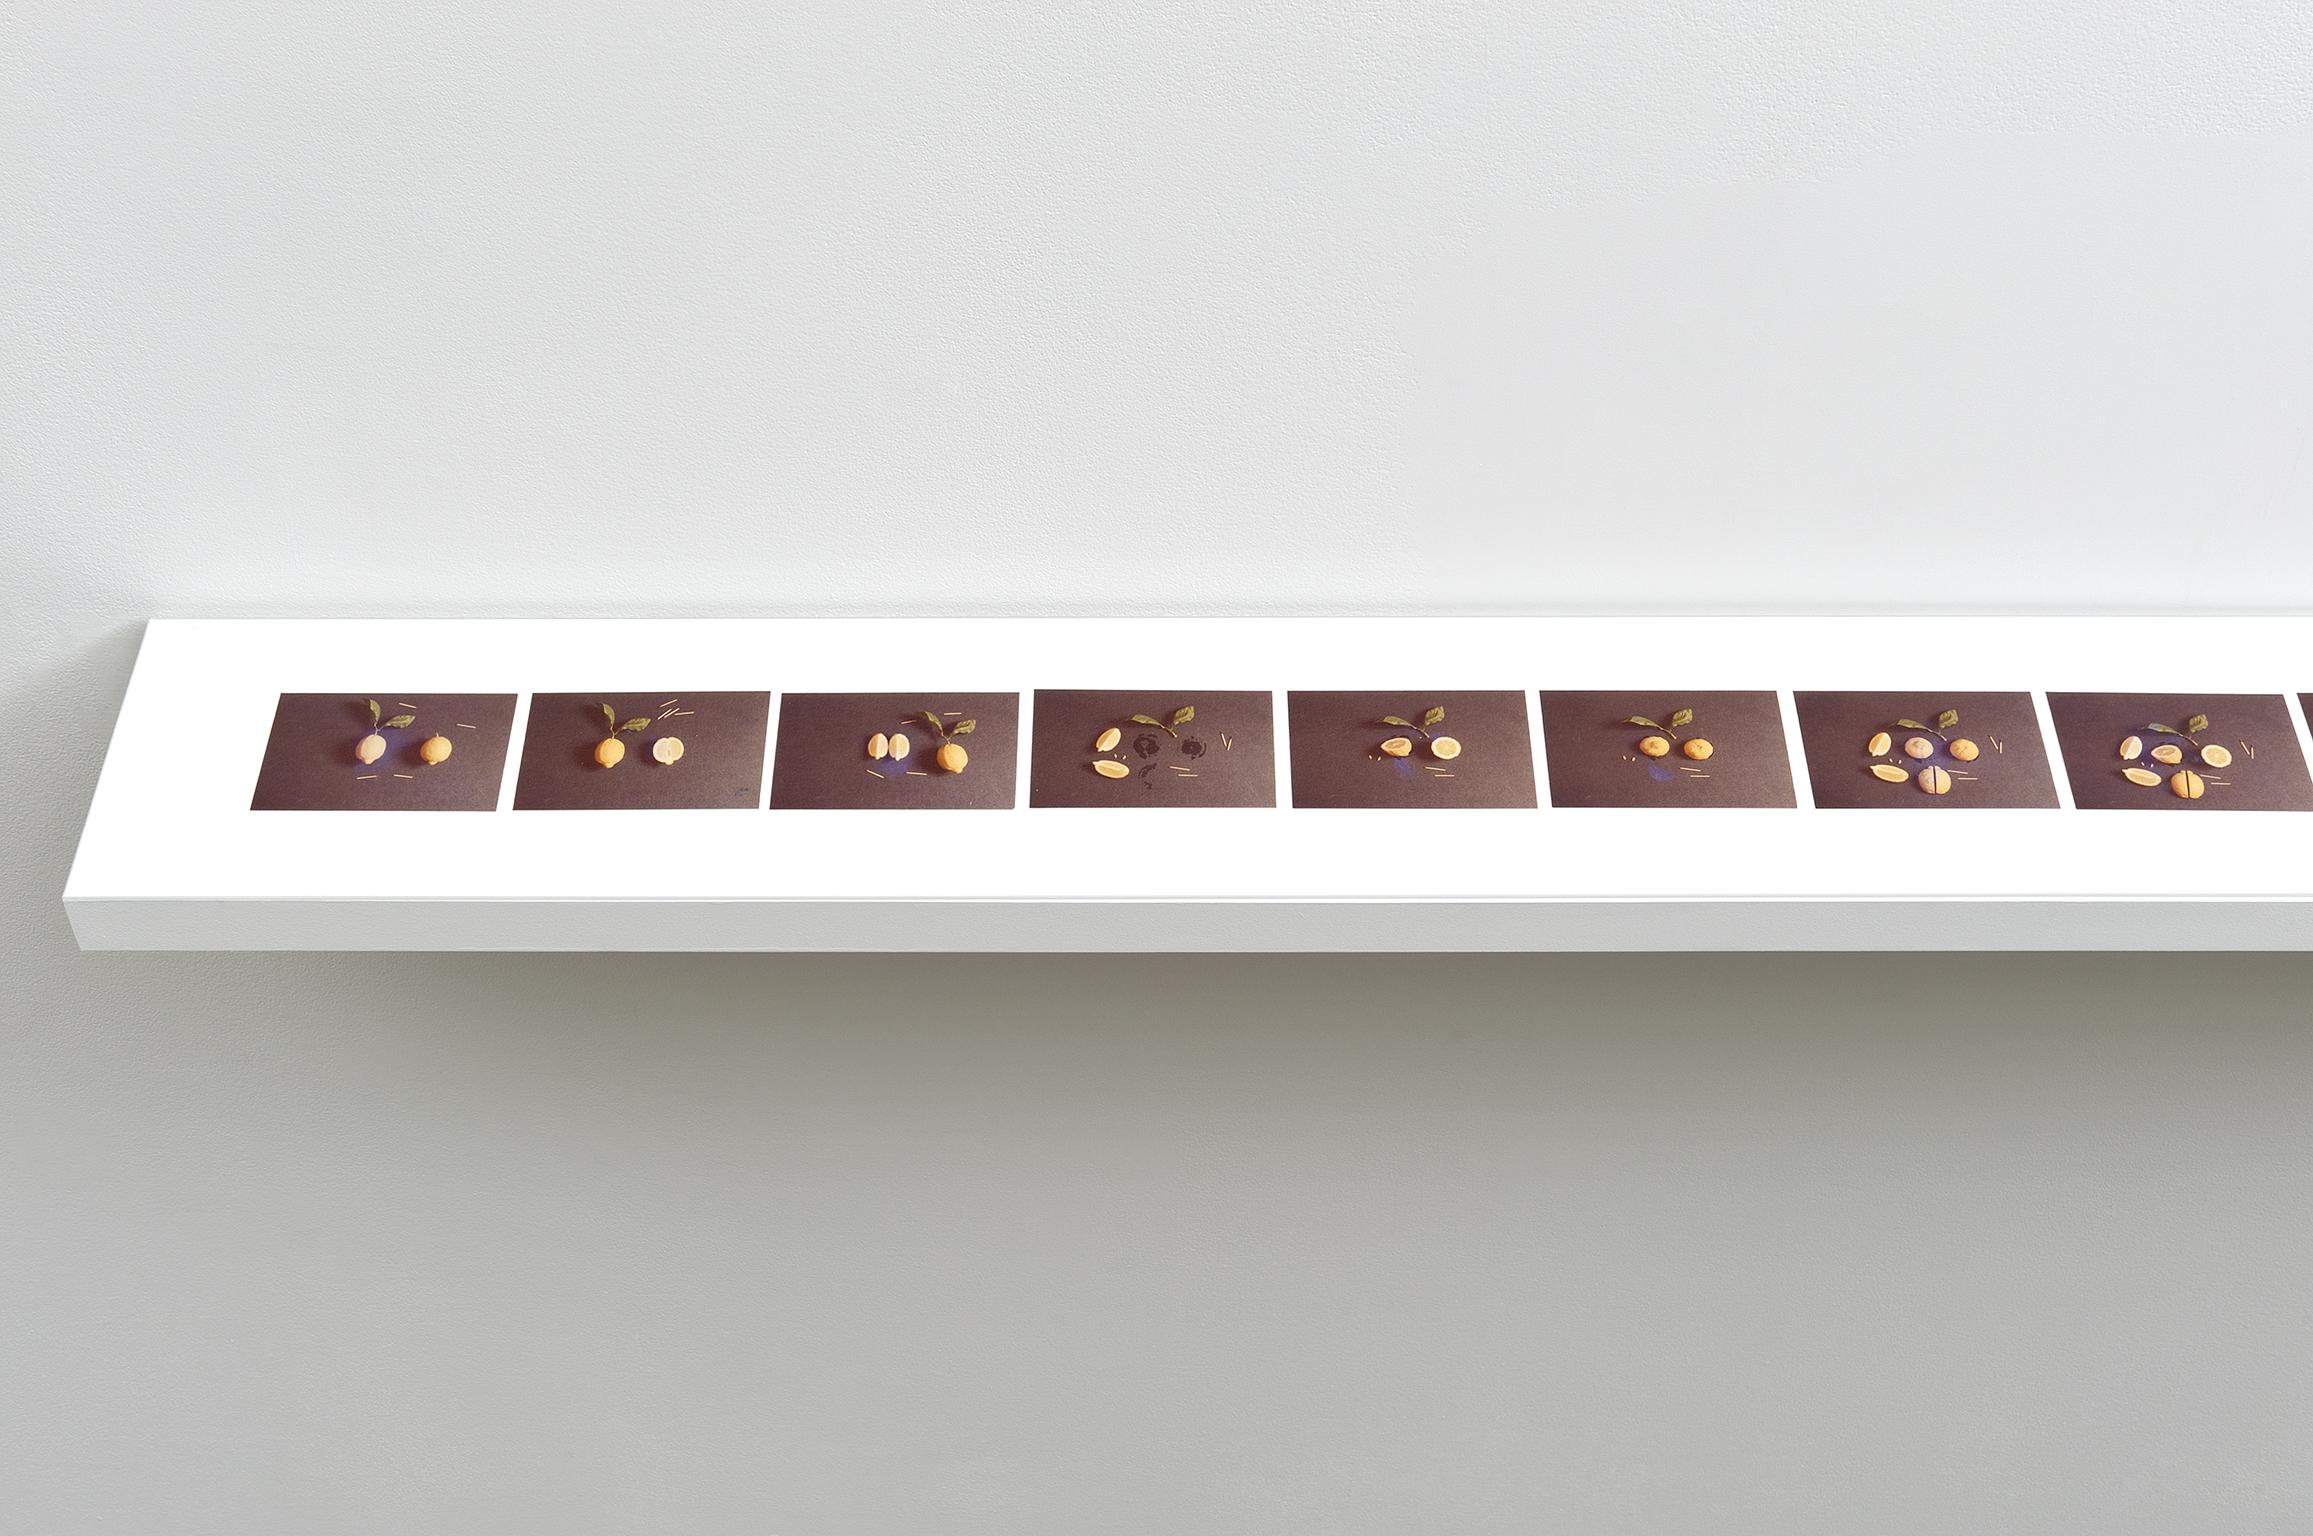 Robert Kleyn, Table with Lemon, 1976, 16 colour photographs, 4 x 5 in. (9 x 12 cm) by